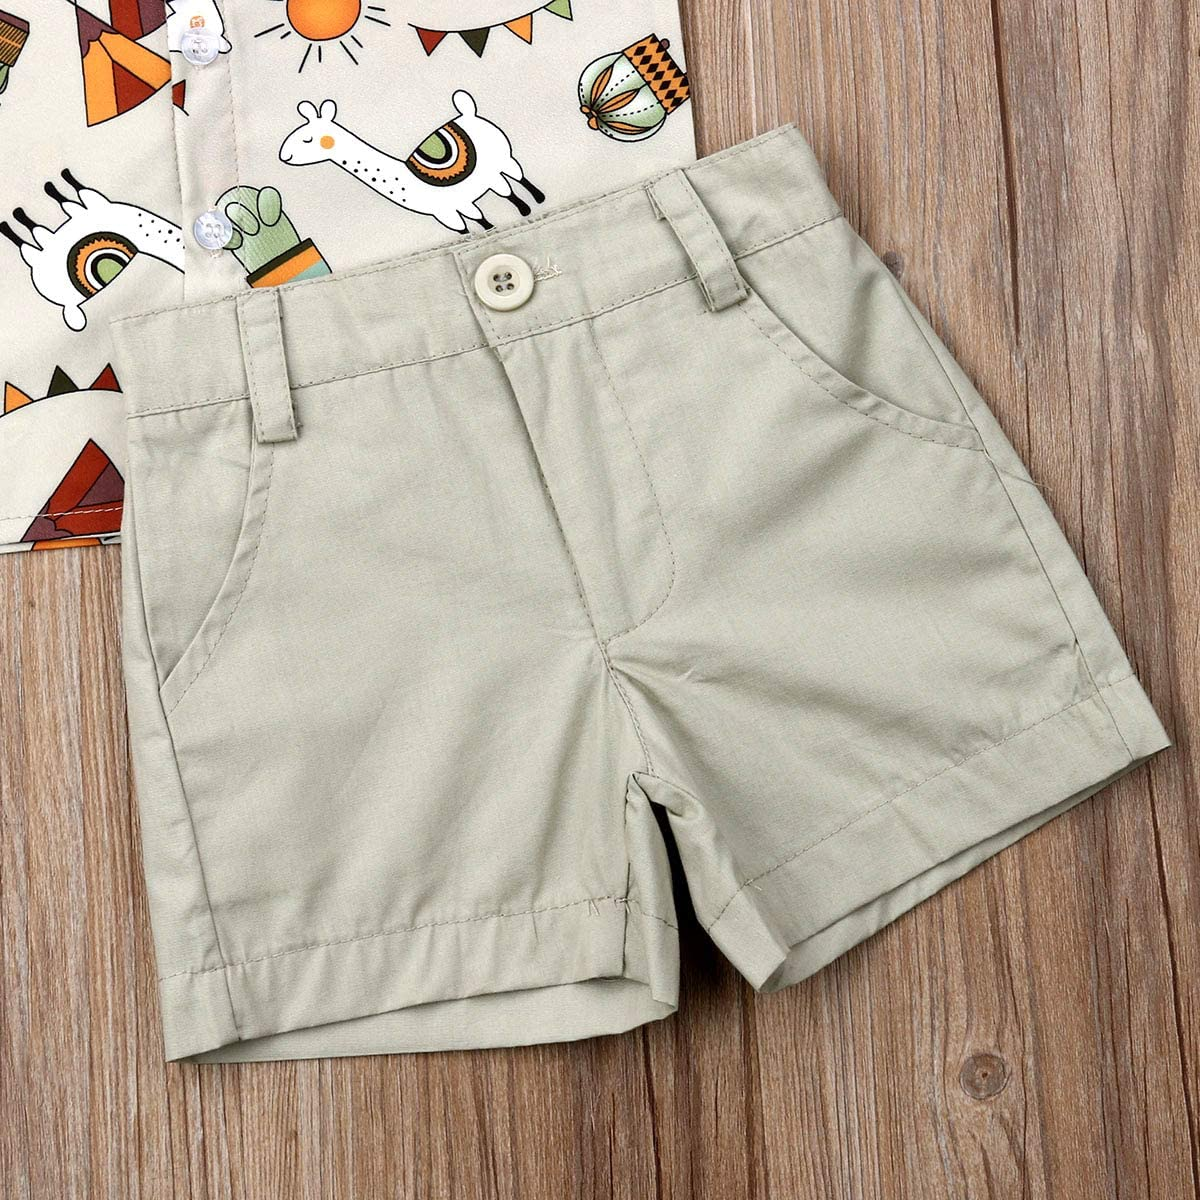 Toddler Kid Baby Boys Short Sleeve Tops T-Shirt Button Down Shirts Shorts Pants 2Pcs Summer Outfits 1-6Y